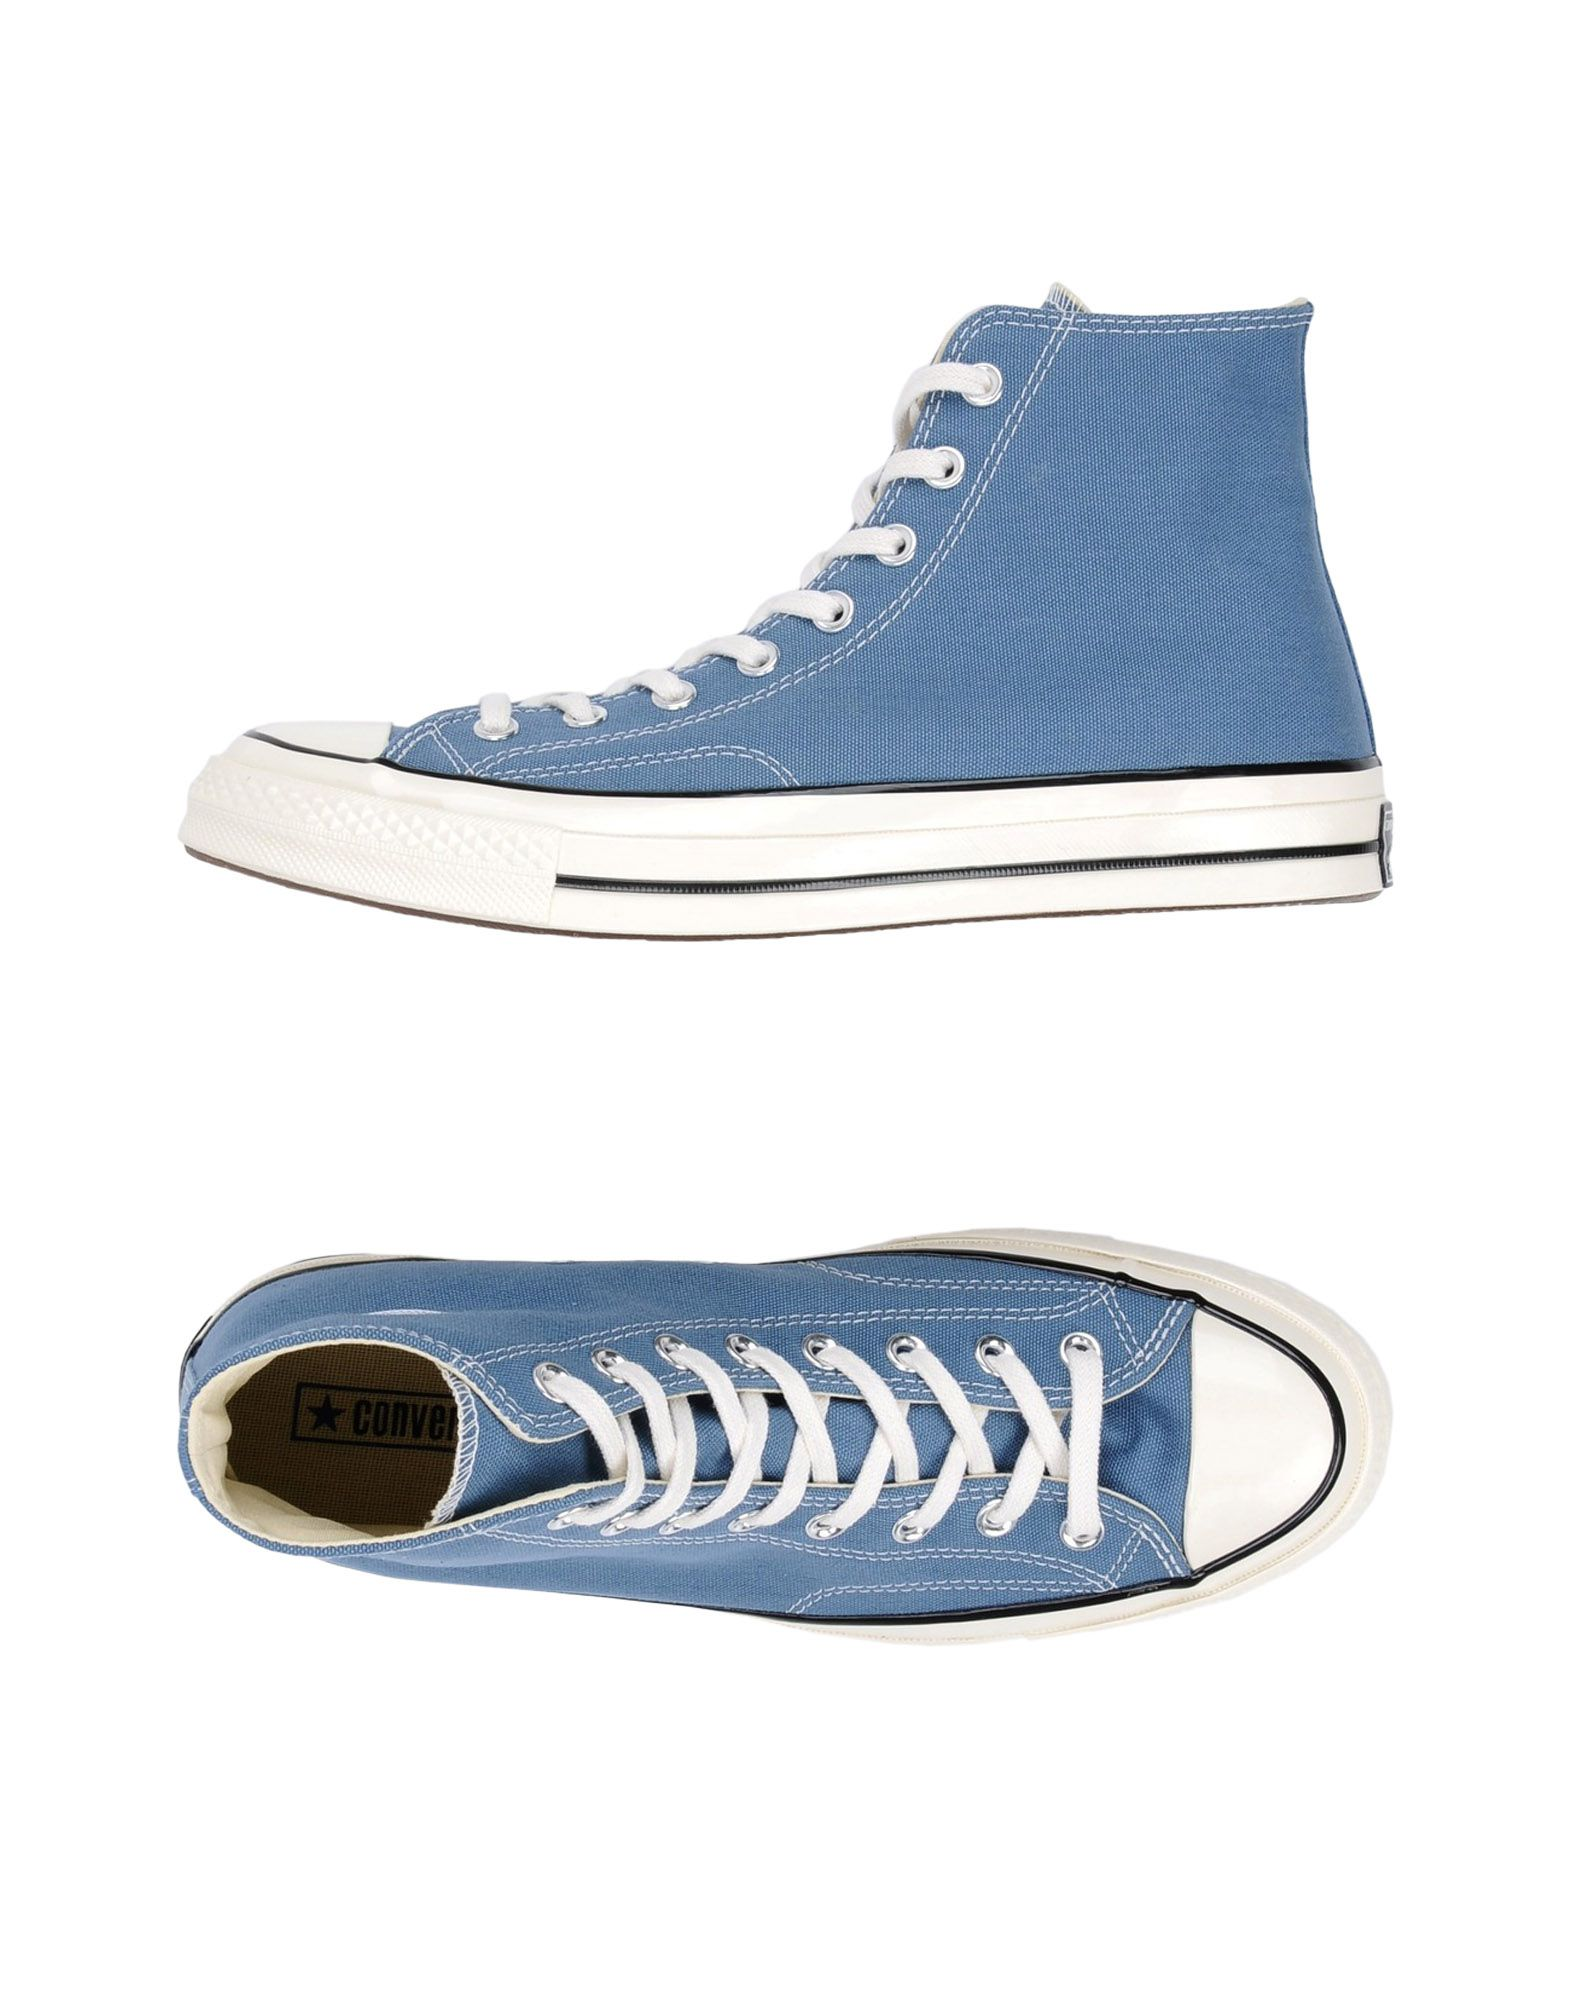 Sneakers Converse All Star Ct As Hi 70'S Vintage Canvas - Uomo - 11273115TR